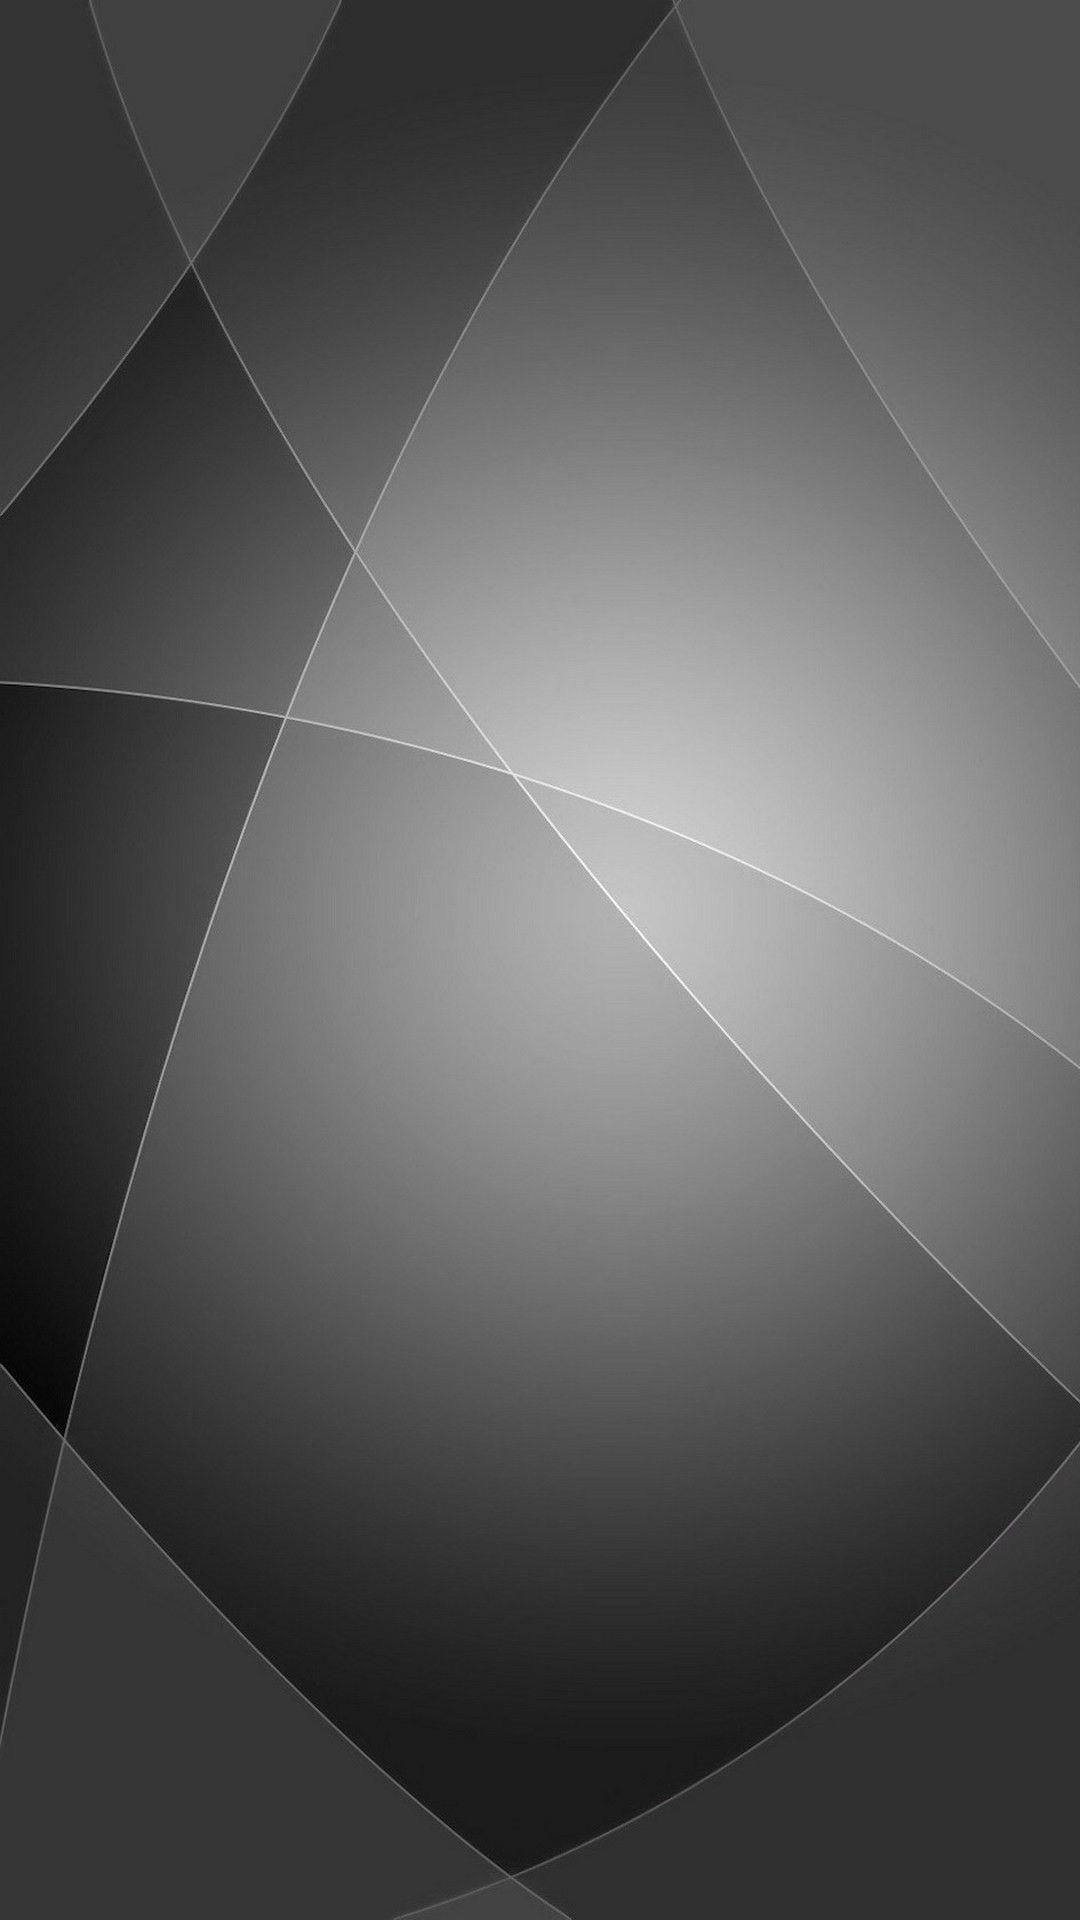 Grey shapes Mobile Wallpaper 4229